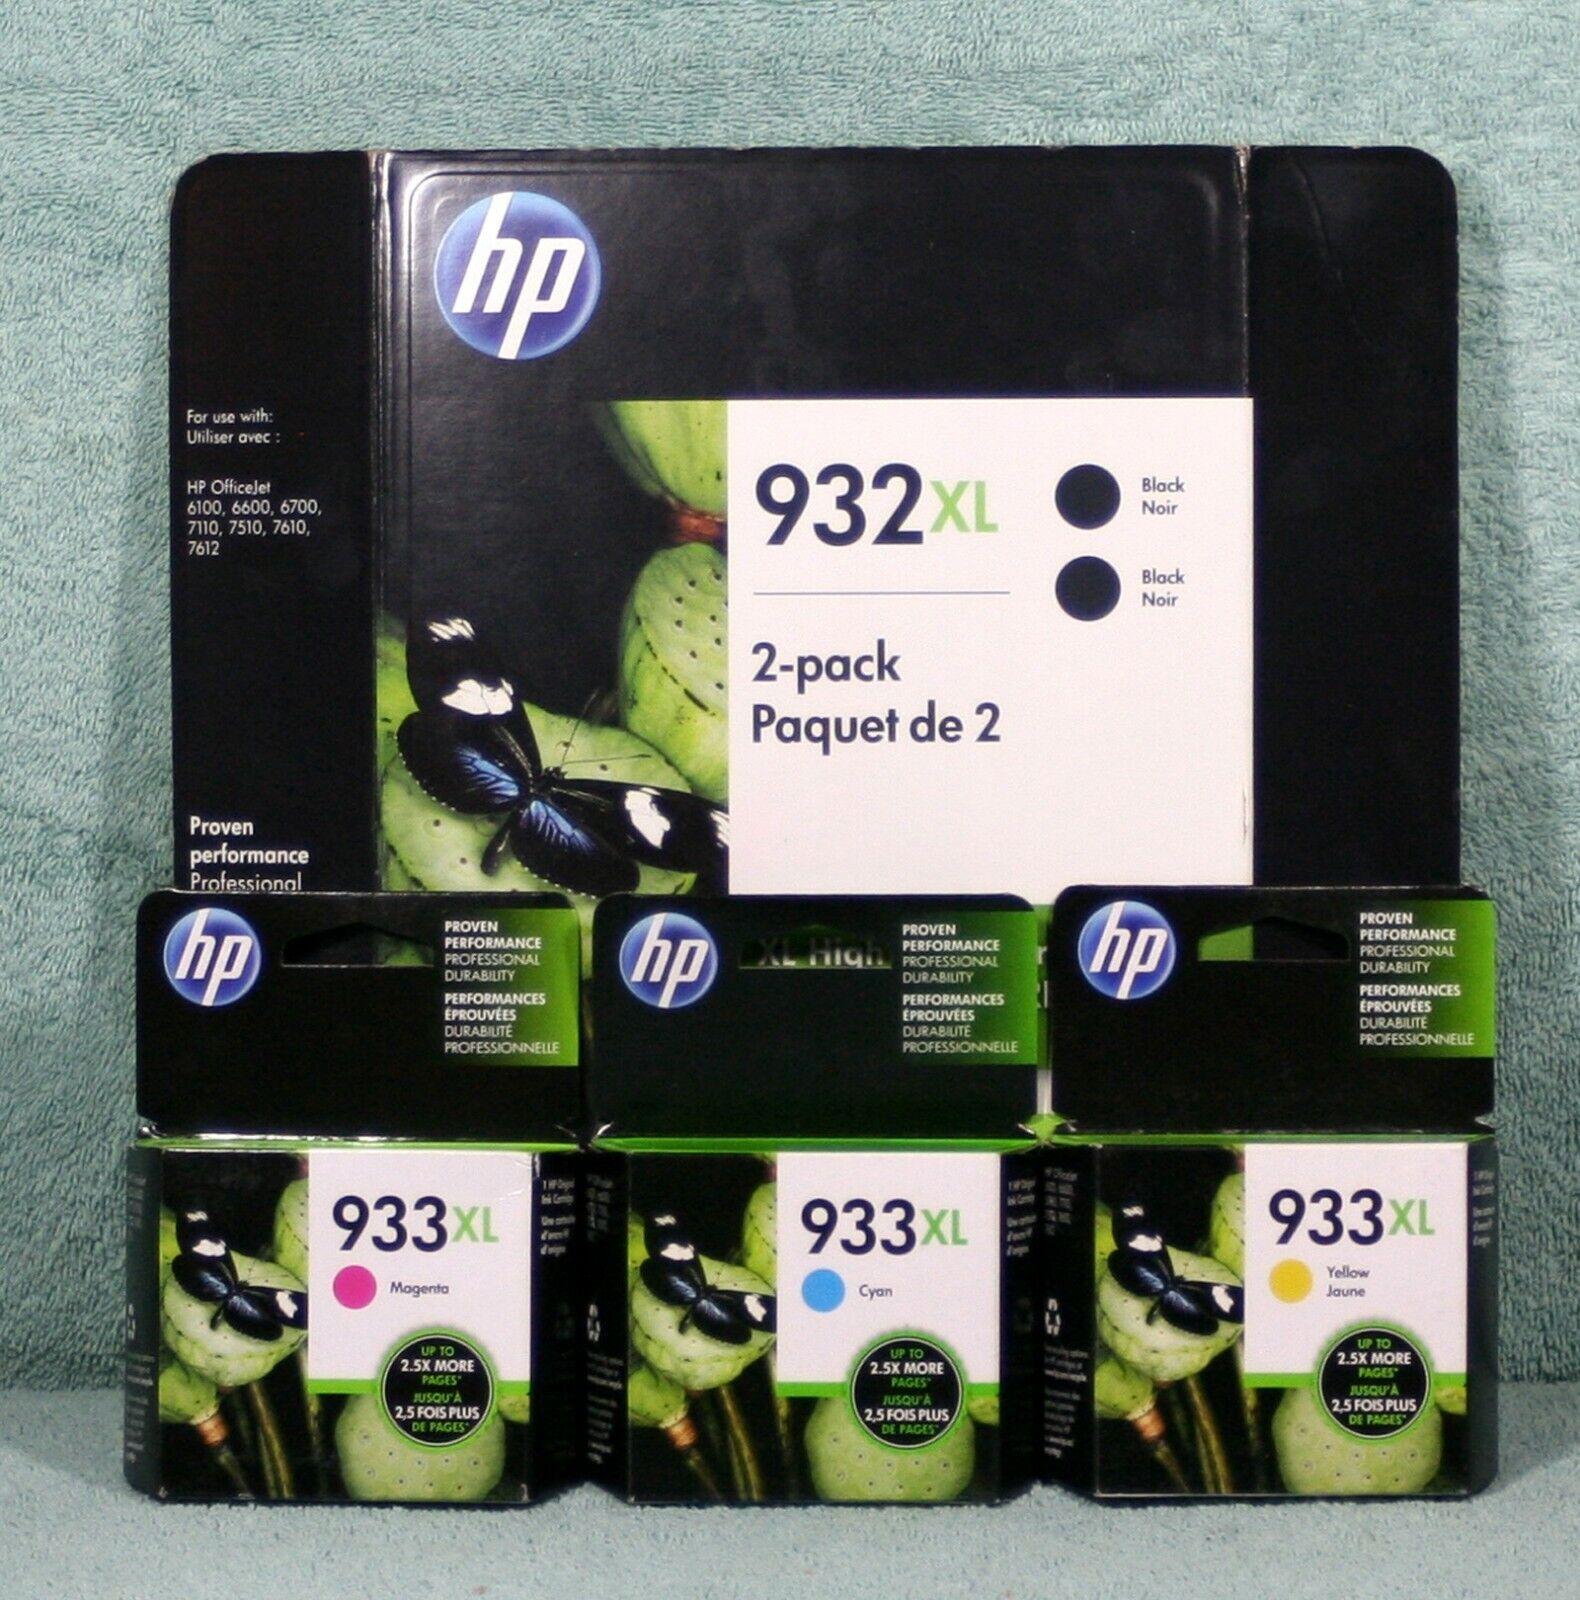 5 New HP 932XL Black 2 Ea HP 933XL C/M/Y 1ea OEM NIB Exp 08/19 To 03/20  - $32.95